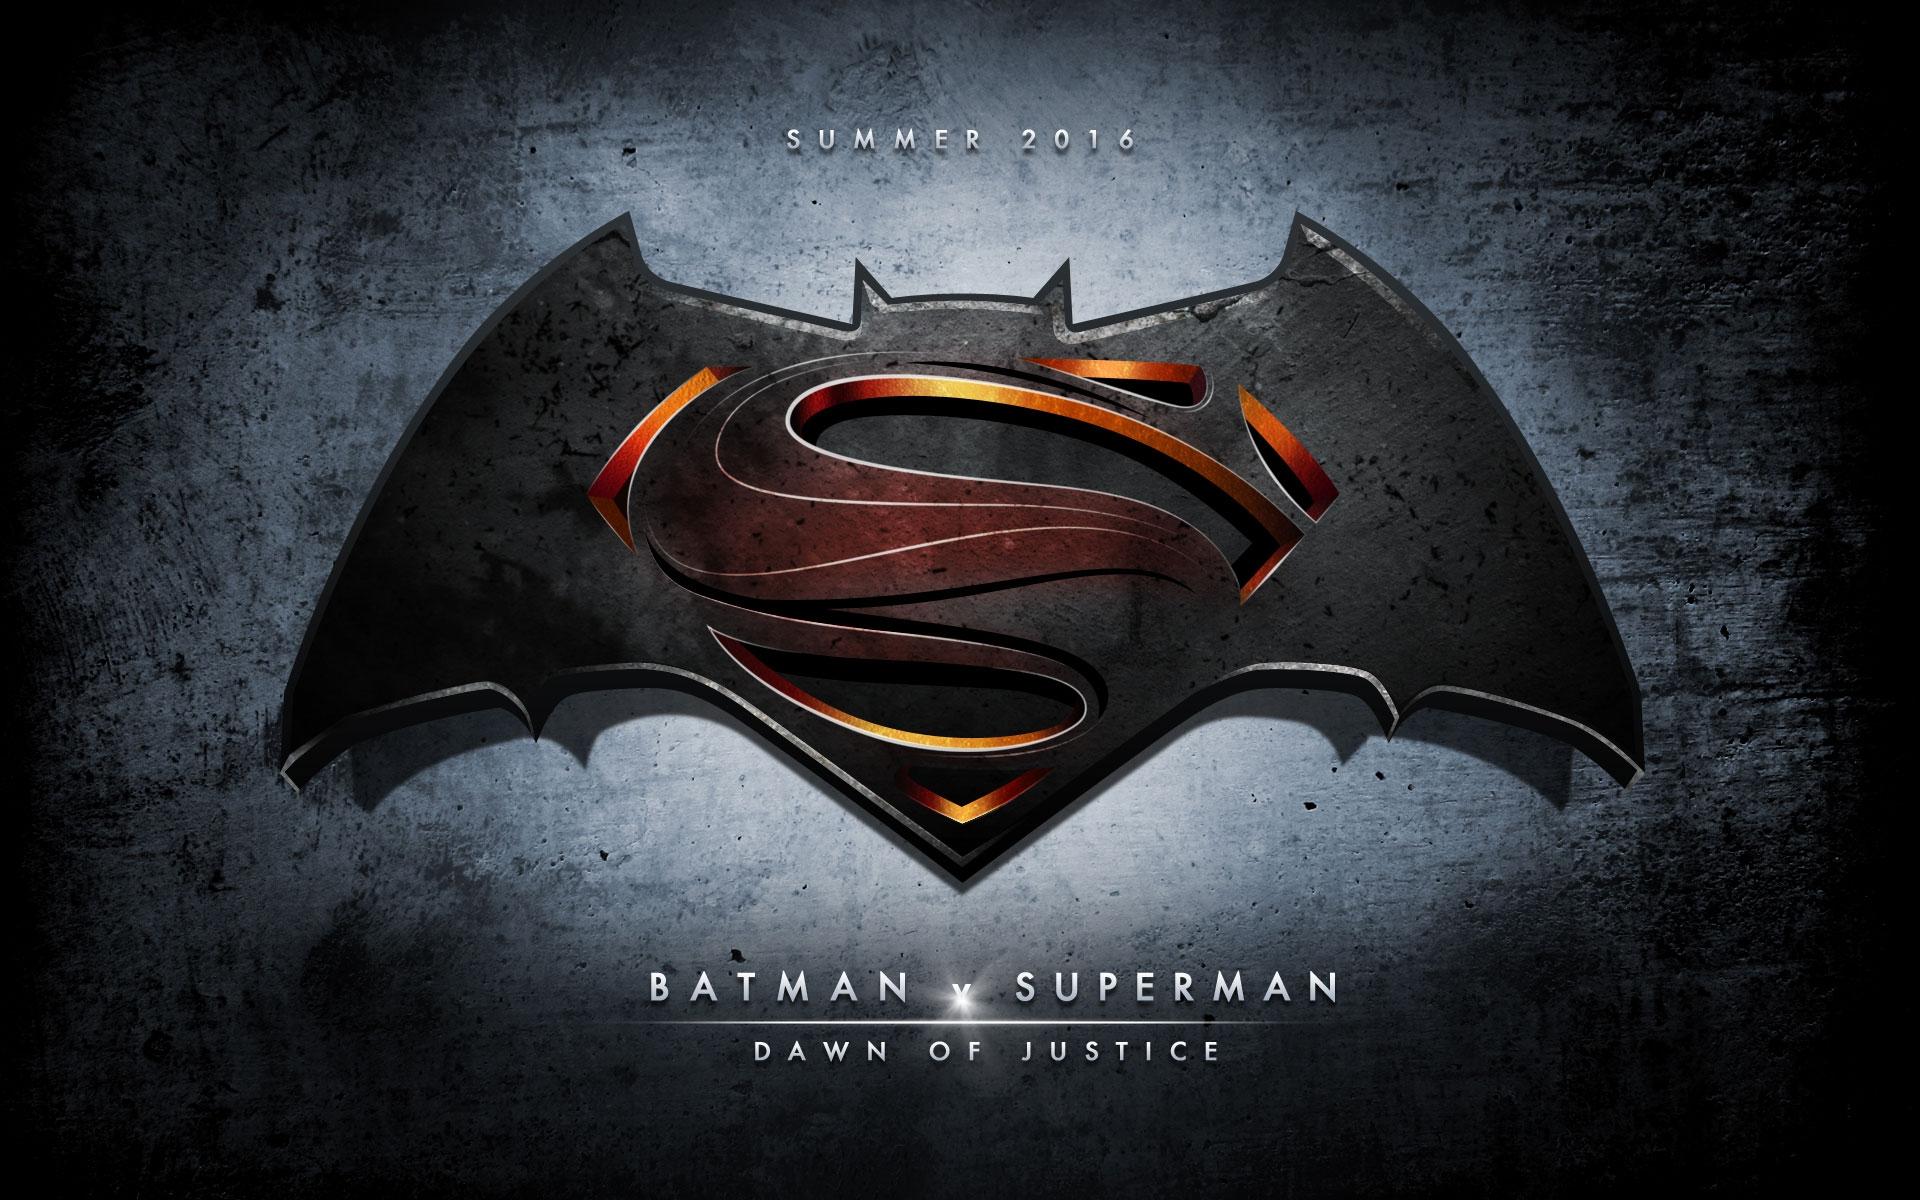 Superman Hd Clipart 1080p.